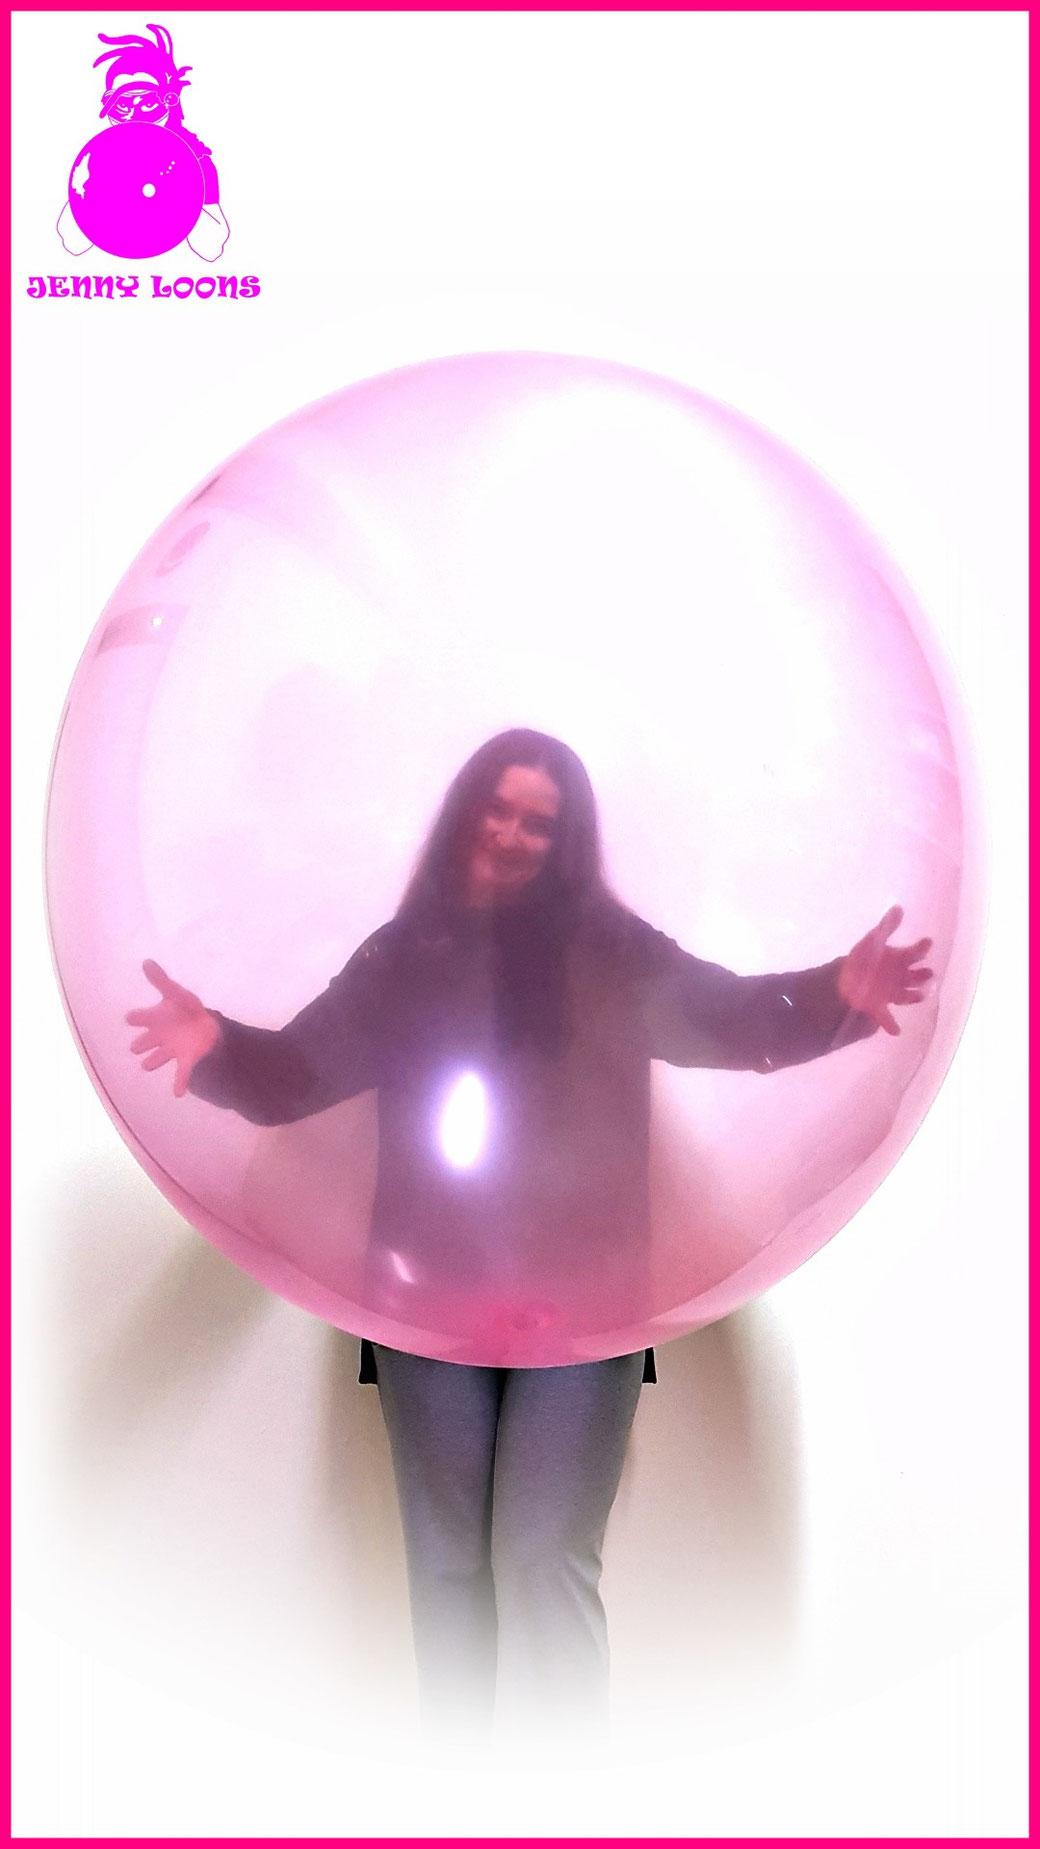 Luftballon Riesenballon Transparent Gian Balloon Kristallfarben Crystal colors cattex